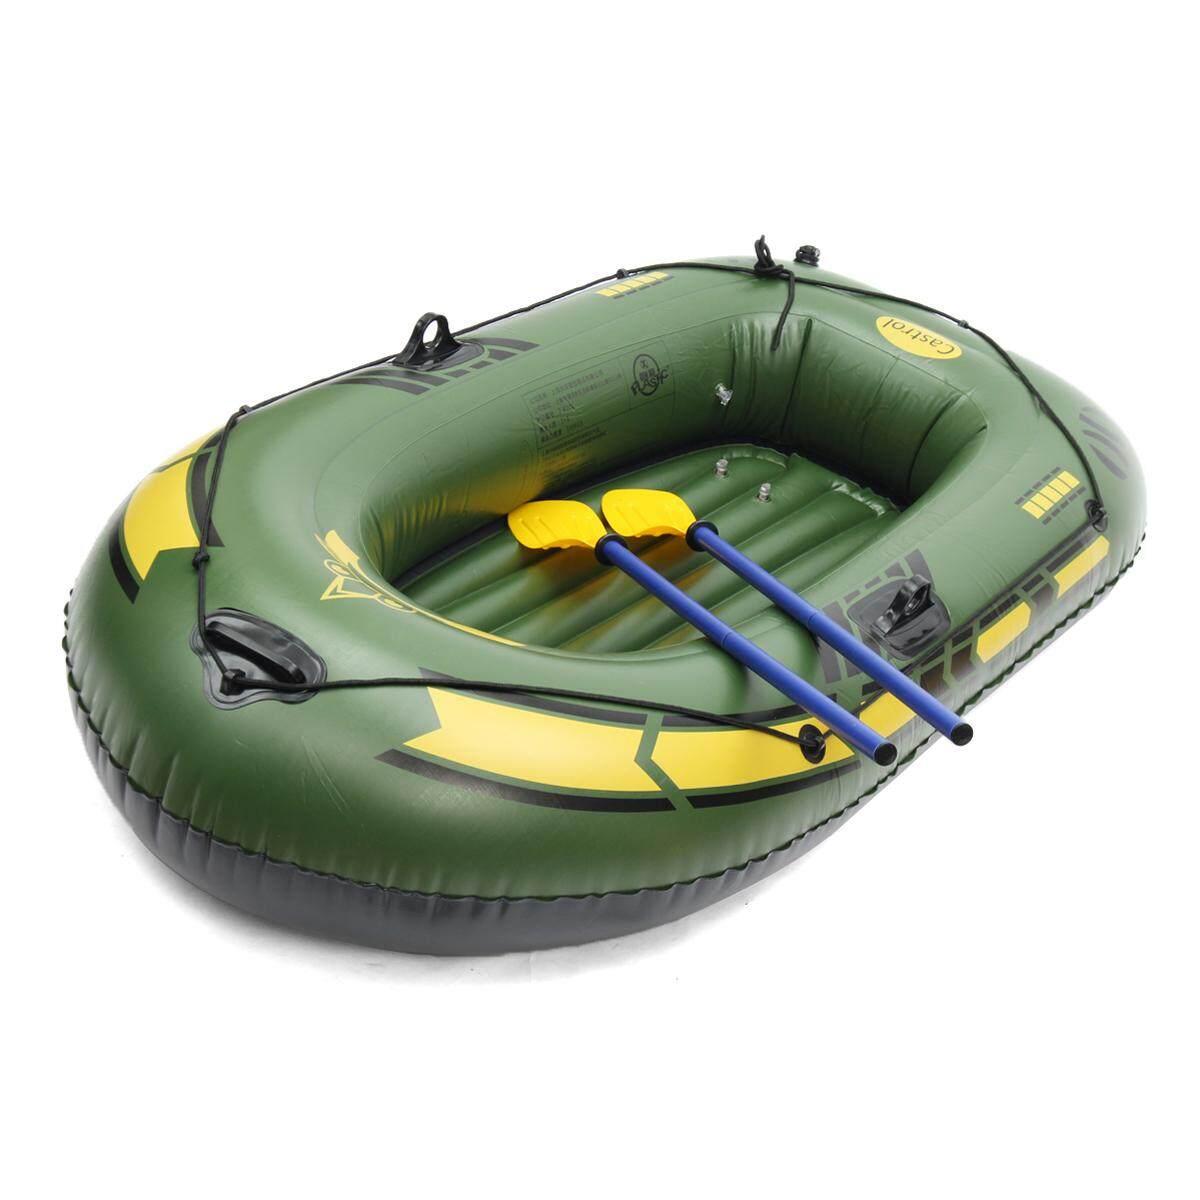 Kapal Dapat Digelembungkan 2 Orang Olahraga Air Memancing Di Sungai Tender Dinghy Set Rakit Kami (2 Orang 190 Cm X 110 Cm)-Intl By Teamtop.